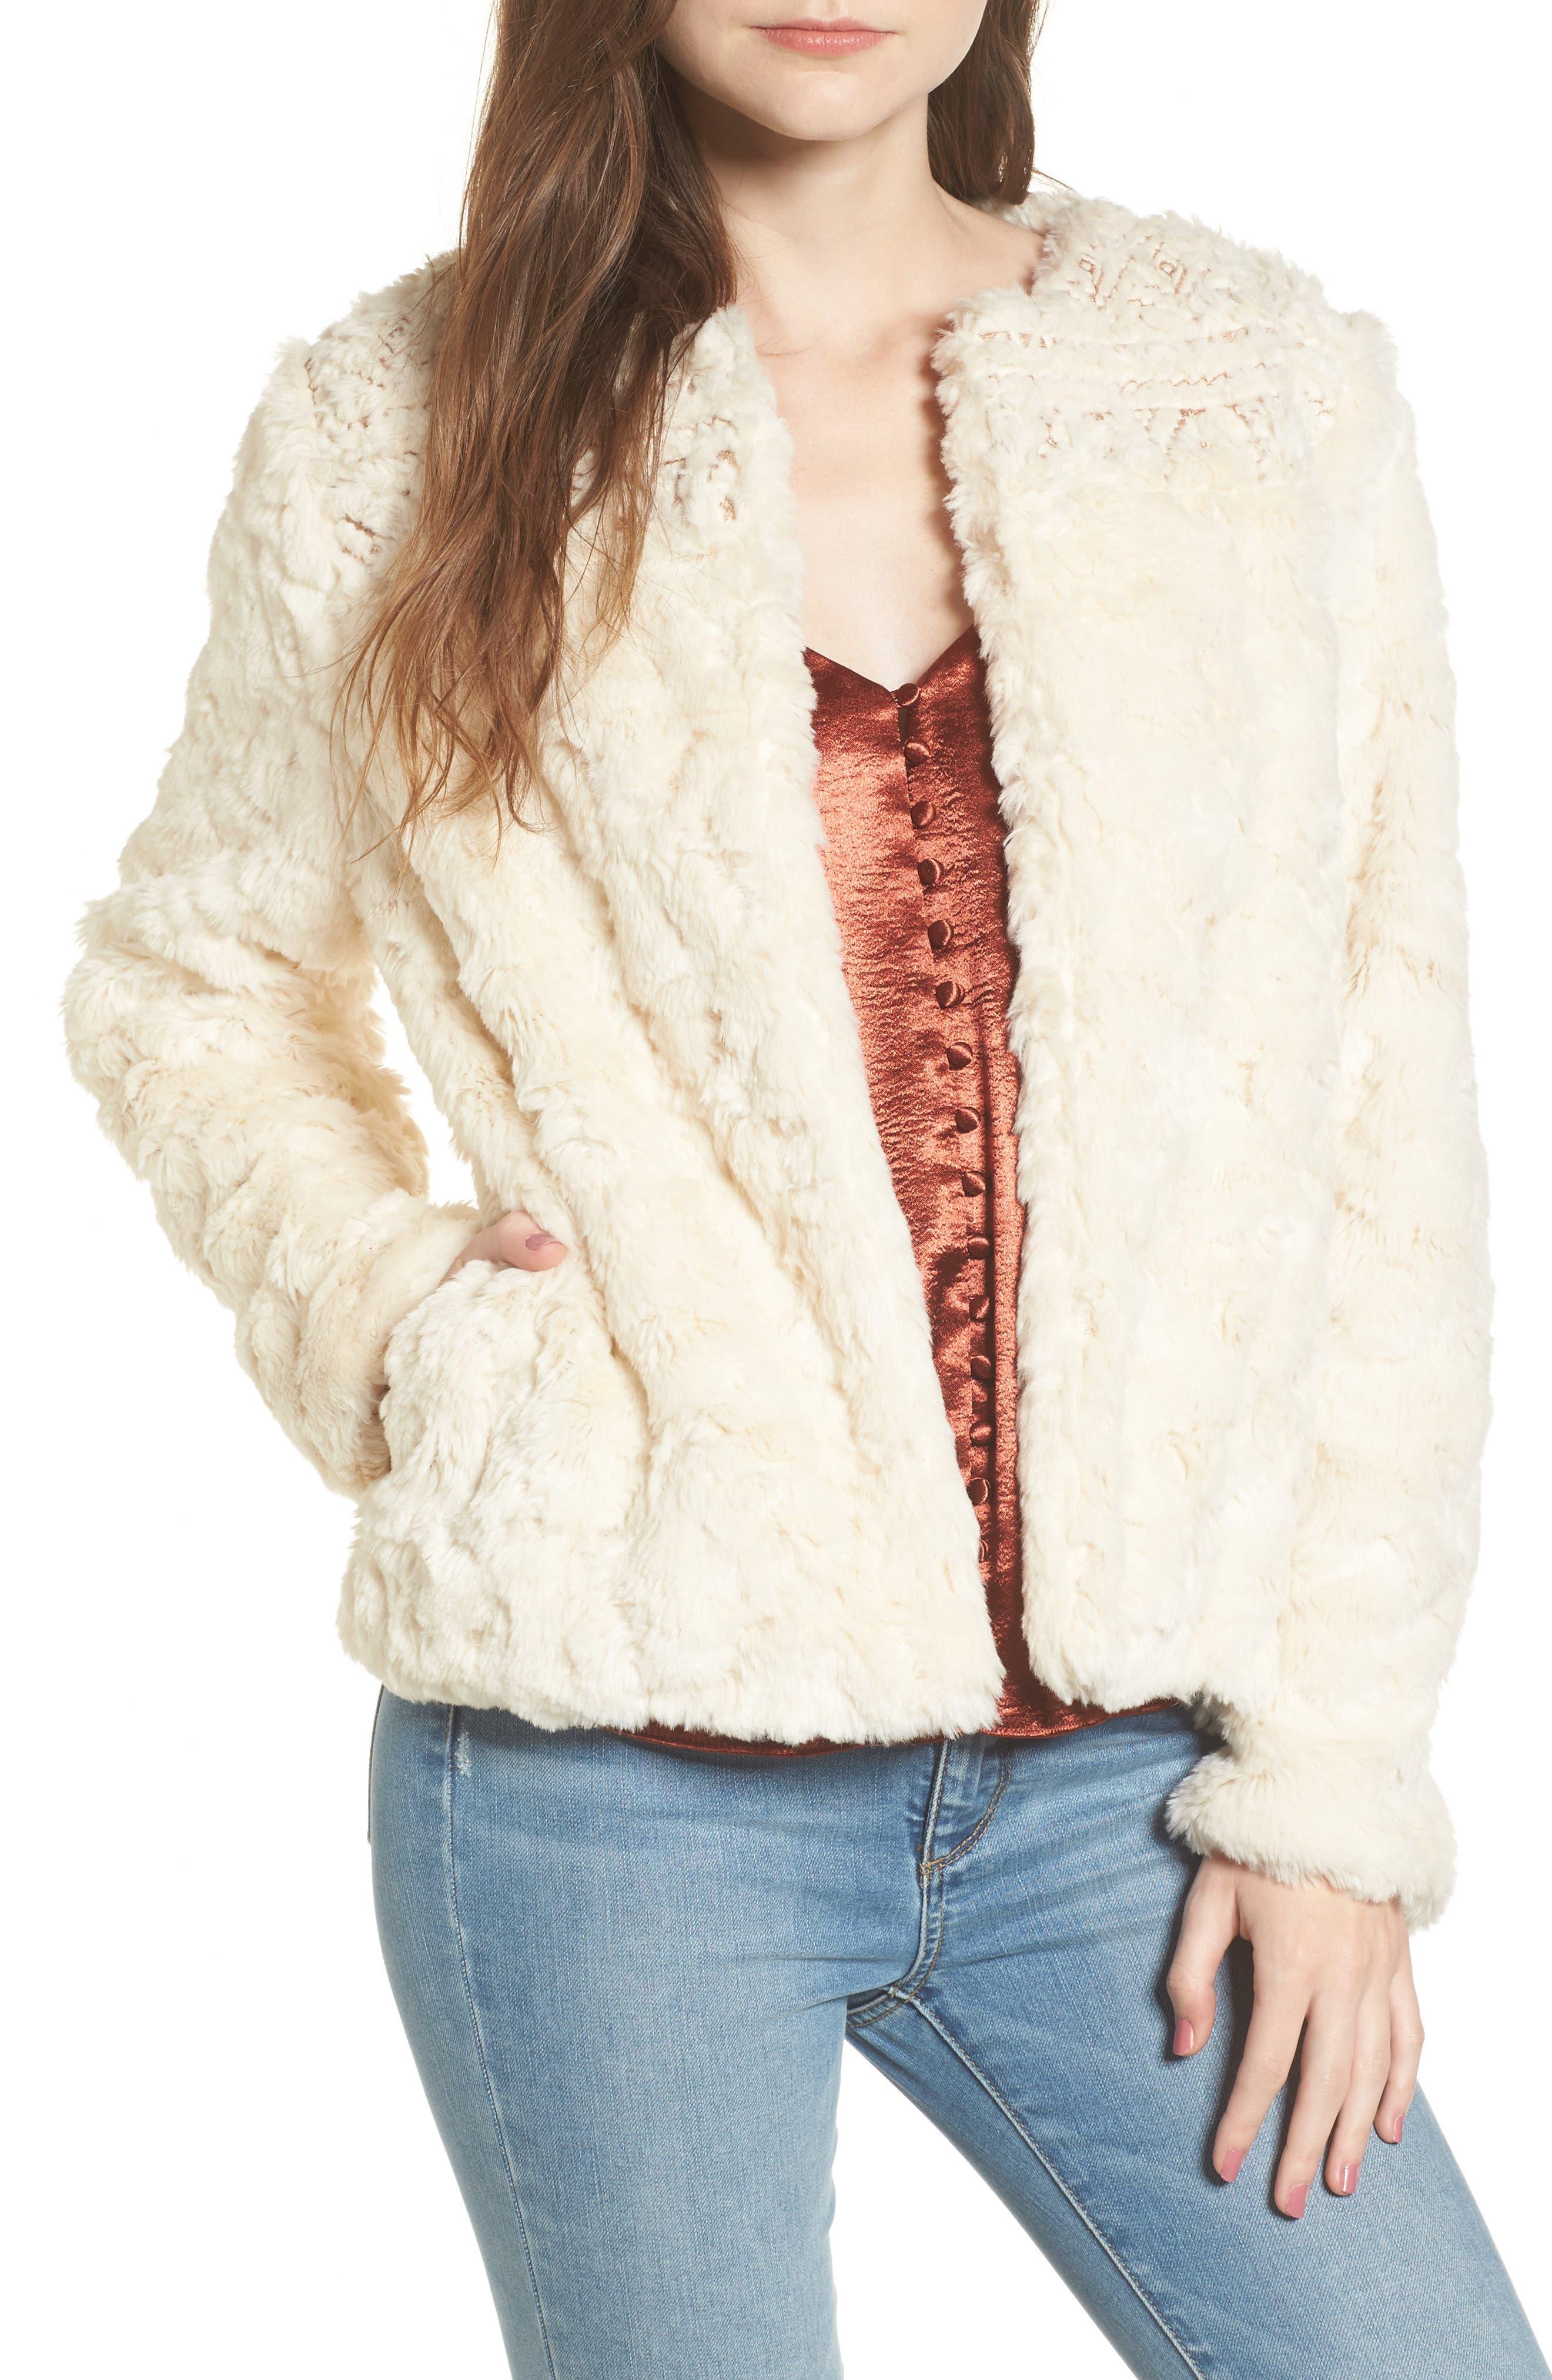 Main Image - Lost + Wander Metallic Embroidery Faux Fur Jacket